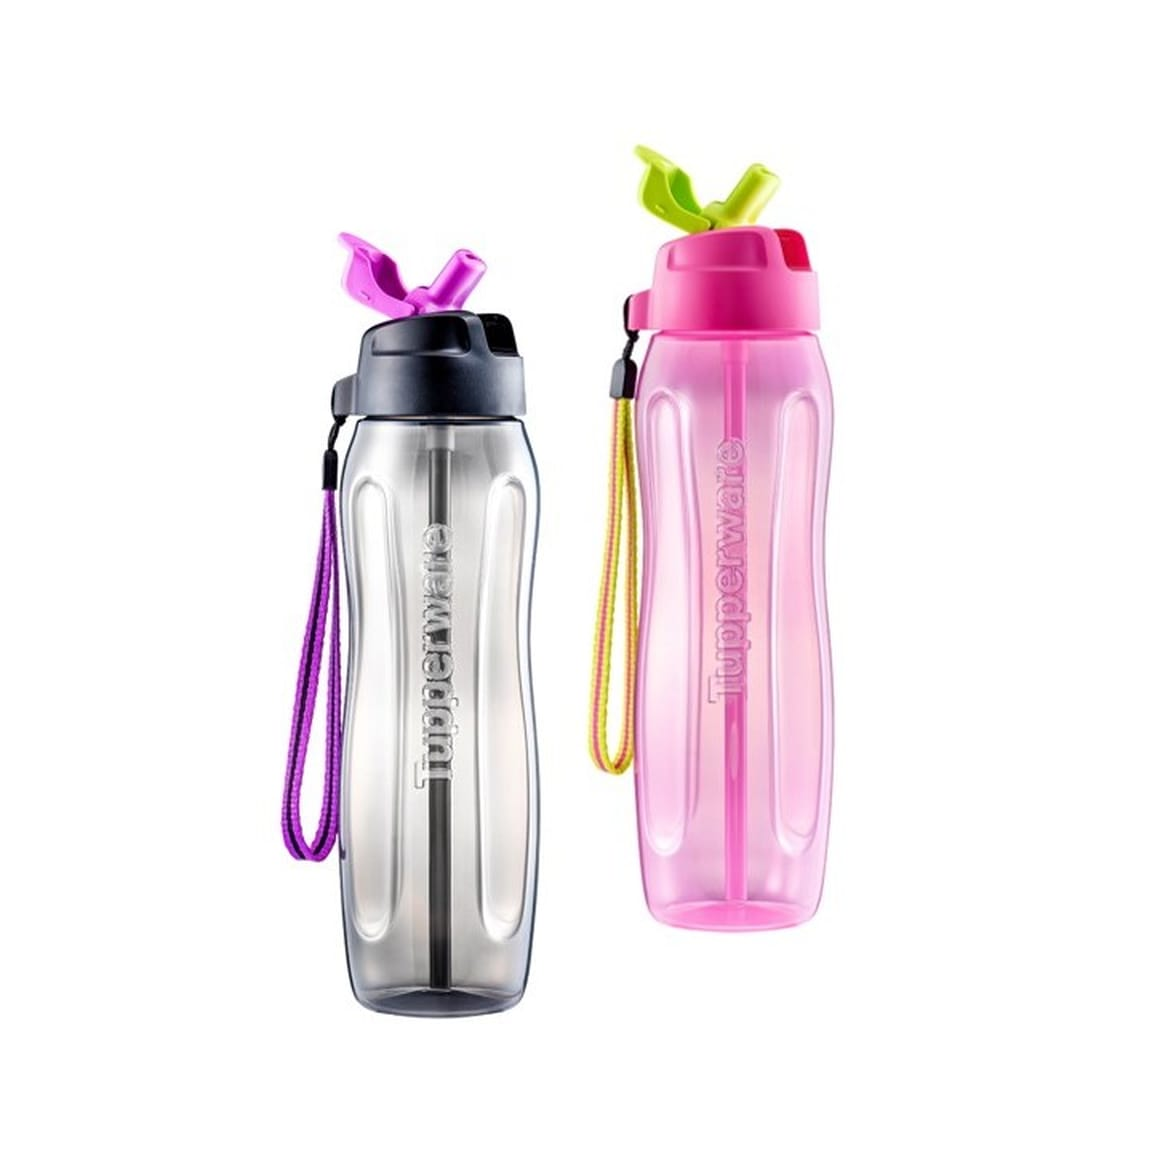 Slim Eco Bottle with straw (2) 750ml (PWP)